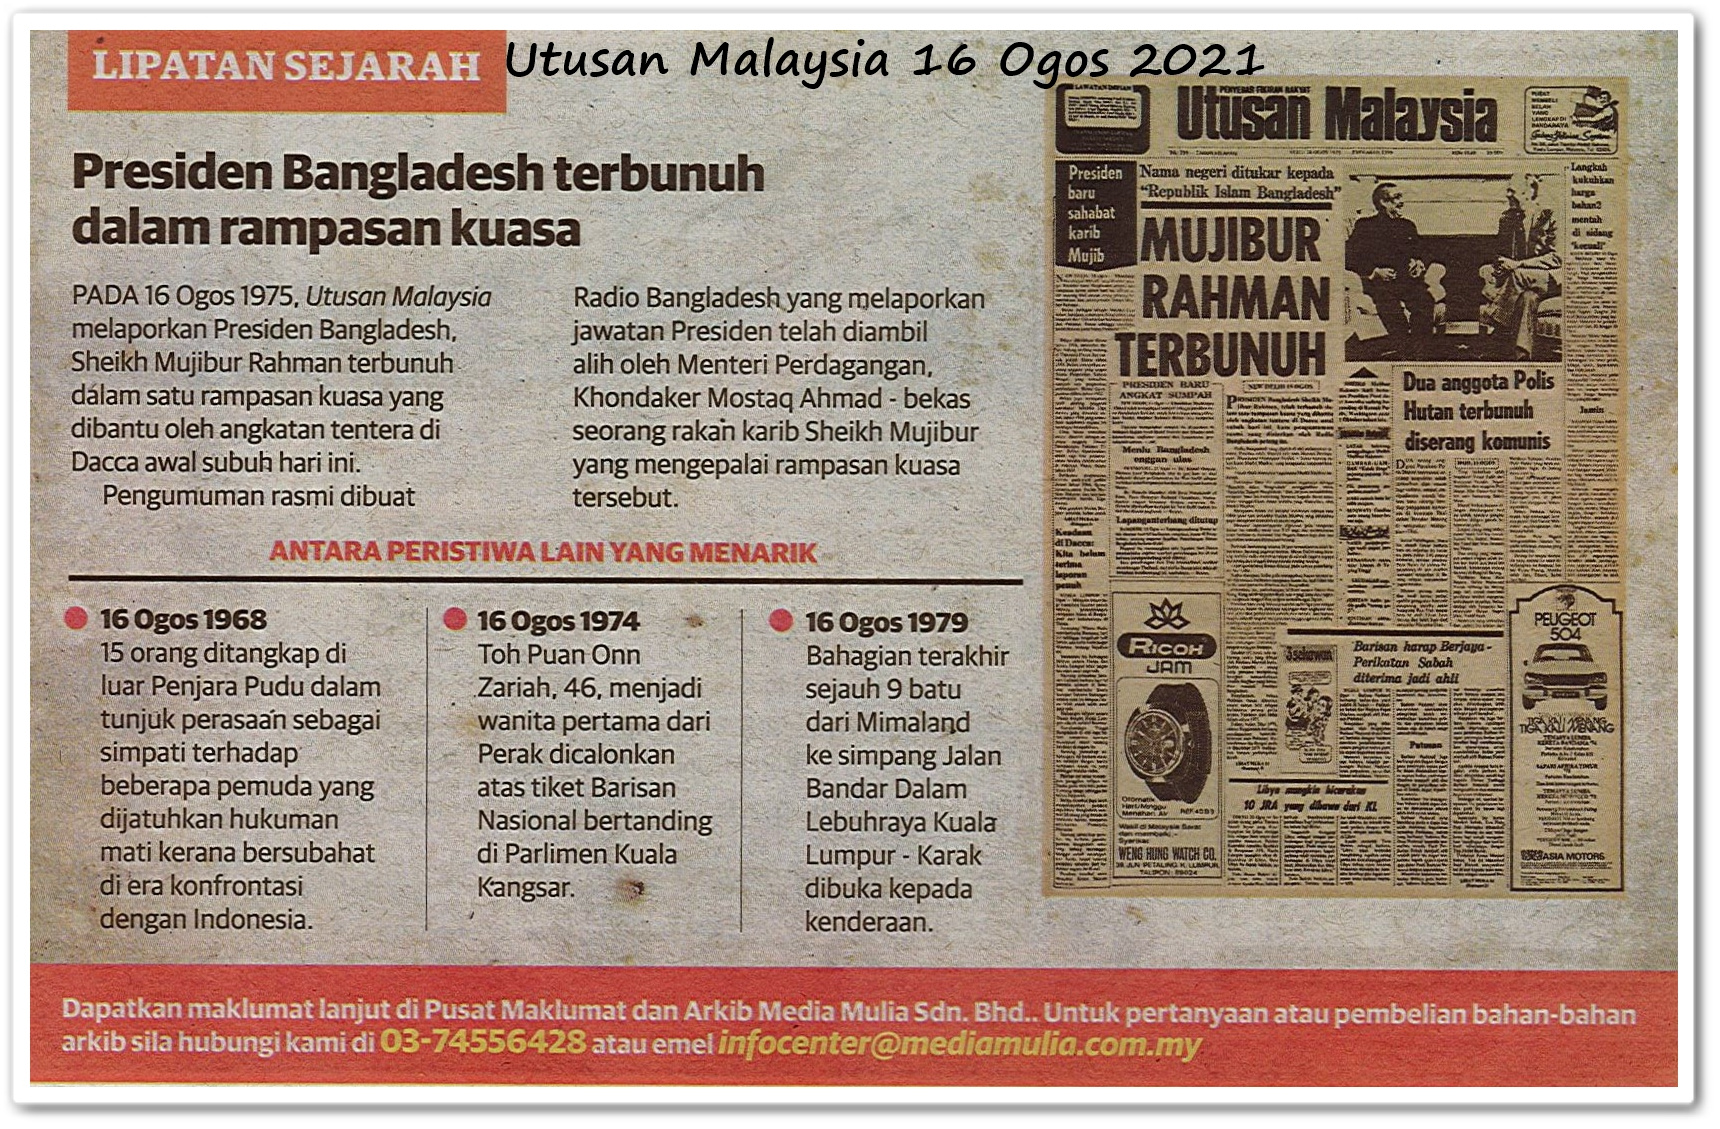 Lipatan sejarah 16 Ogos - Keratan akhbar Utusan Malaysia 16 Ogos 2021